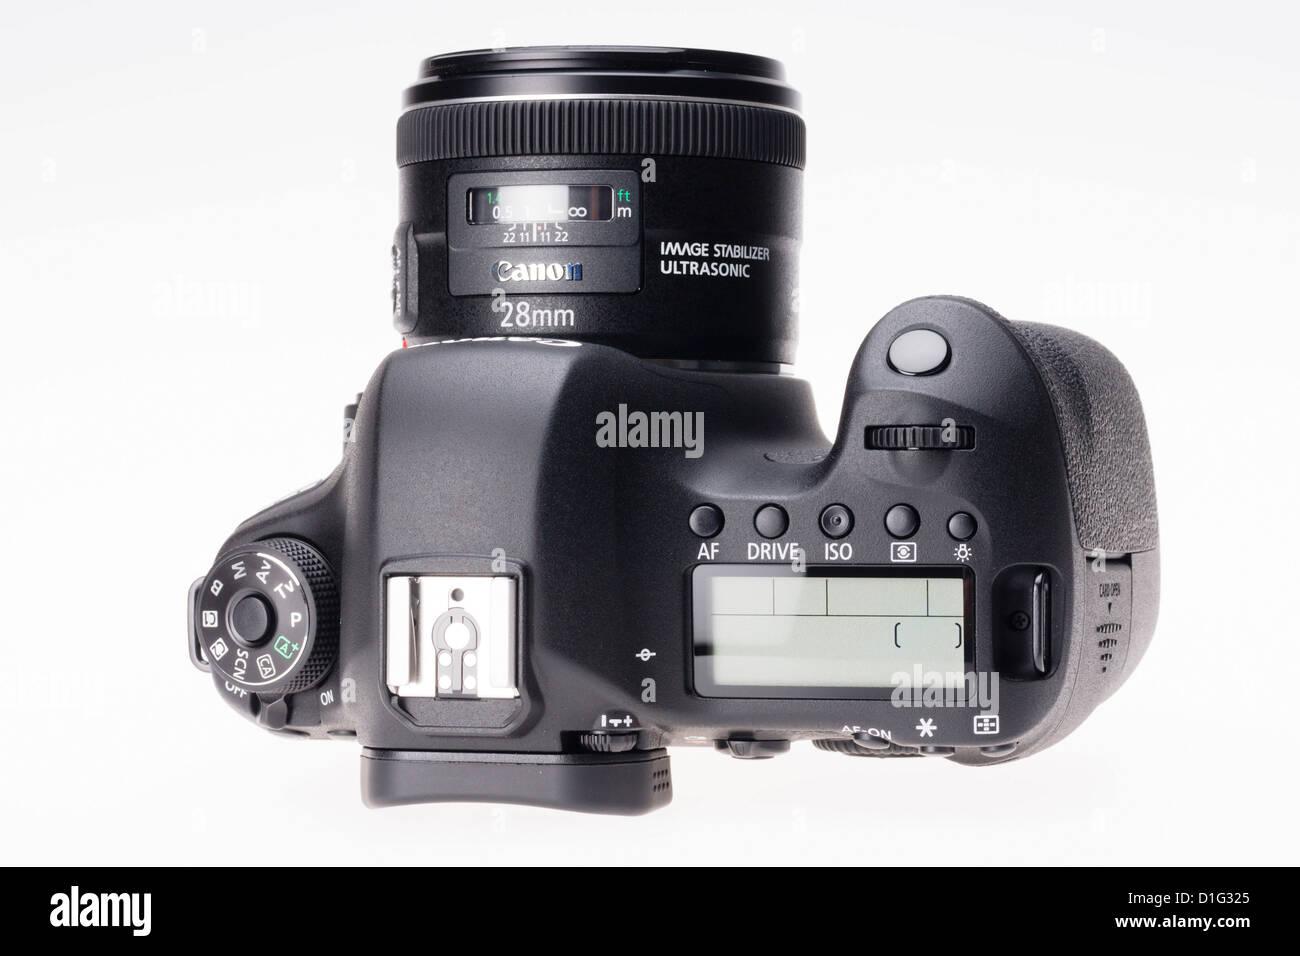 Wunderbar Full Frame Canon Körper Ideen - Benutzerdefinierte ...